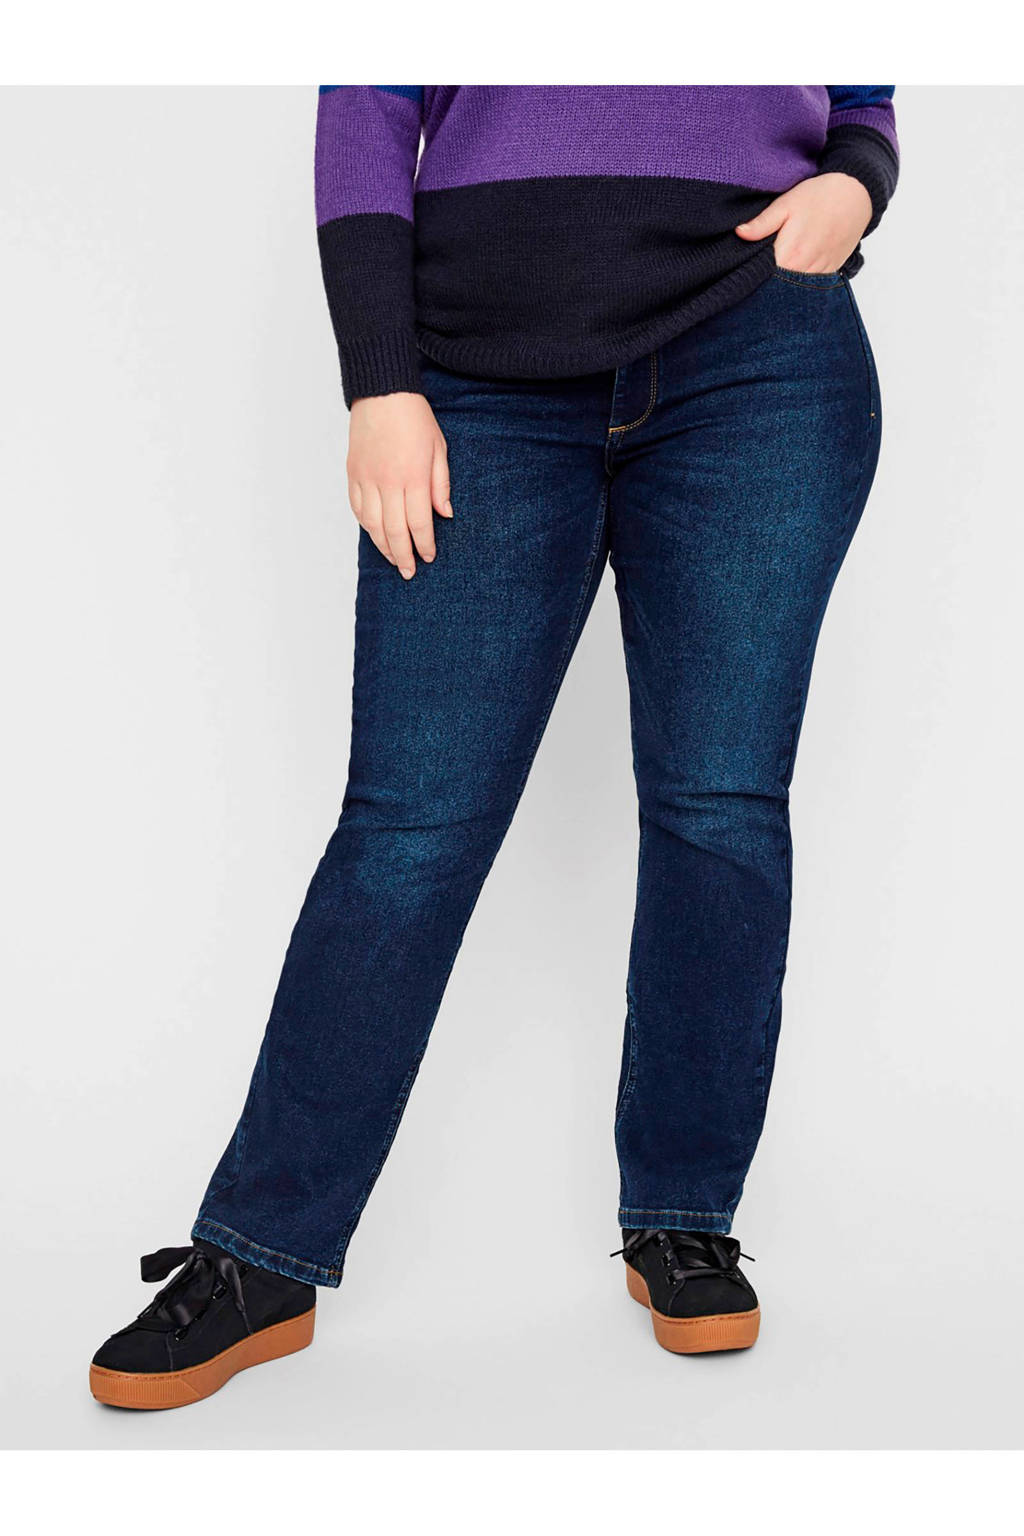 JUNAROSE slim fit jeans dark denim, Dark denim